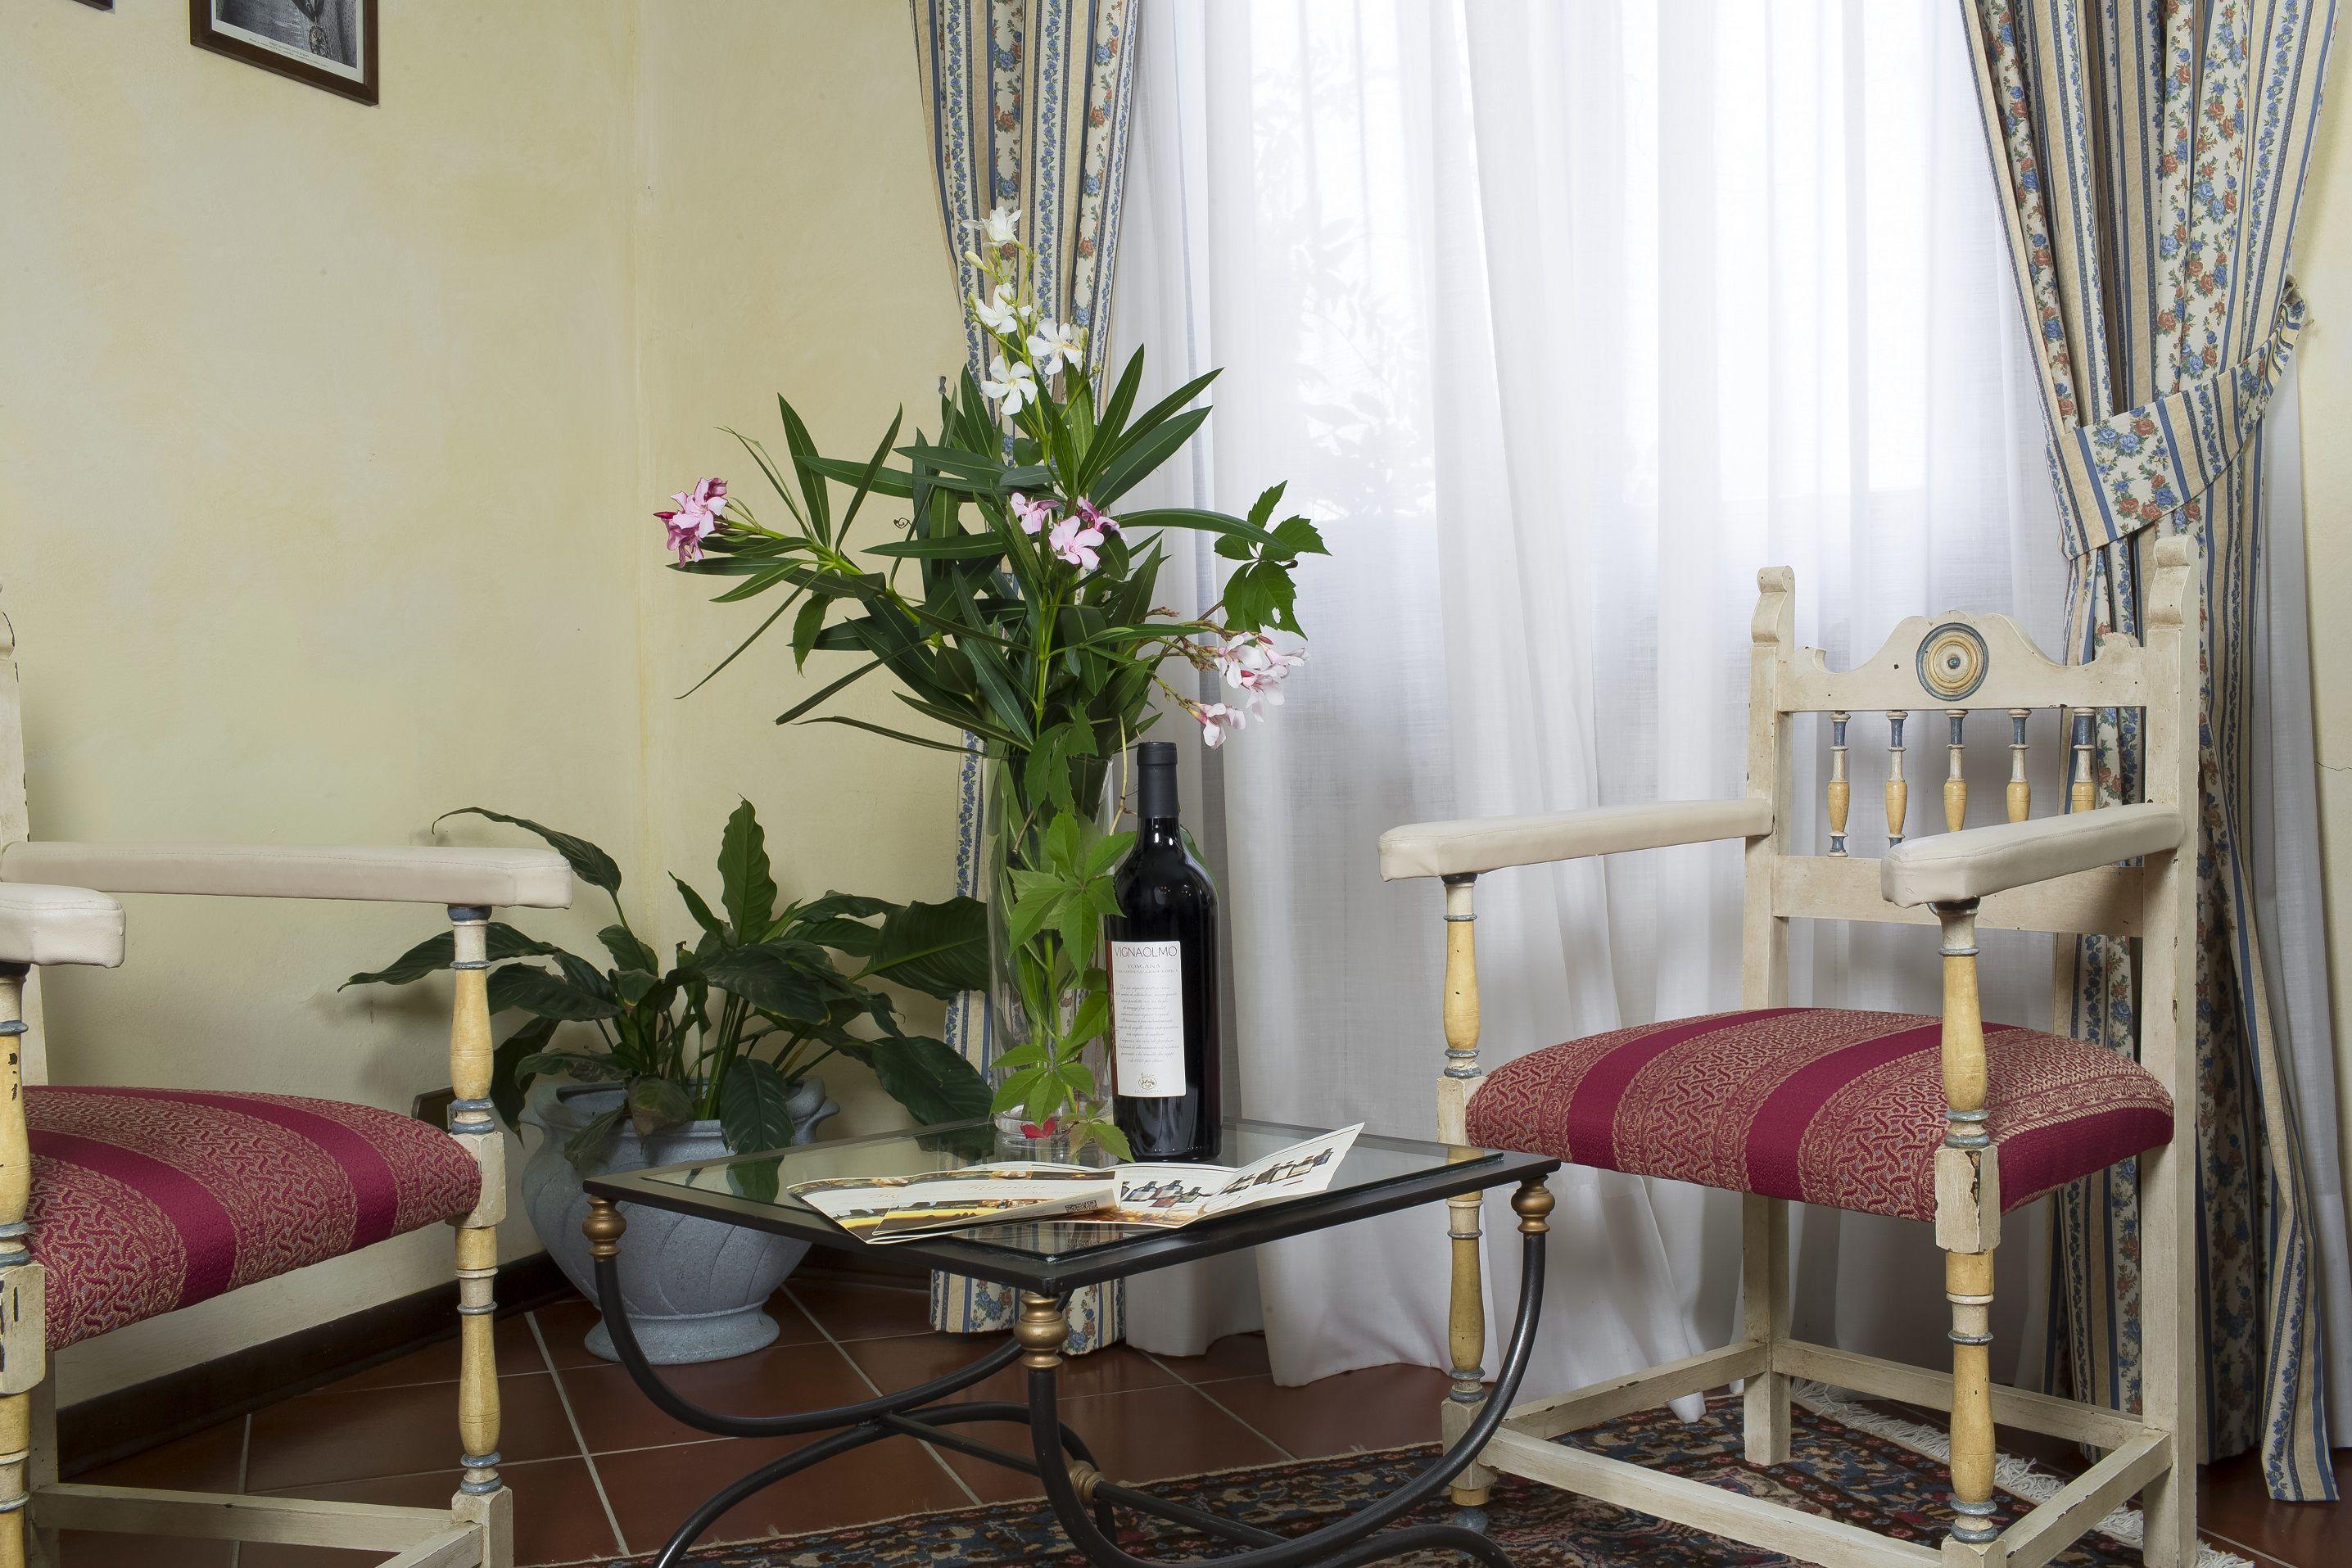 Apartment Bosco Lazzeroni Residence - Aida Holiday Home photo 19005572